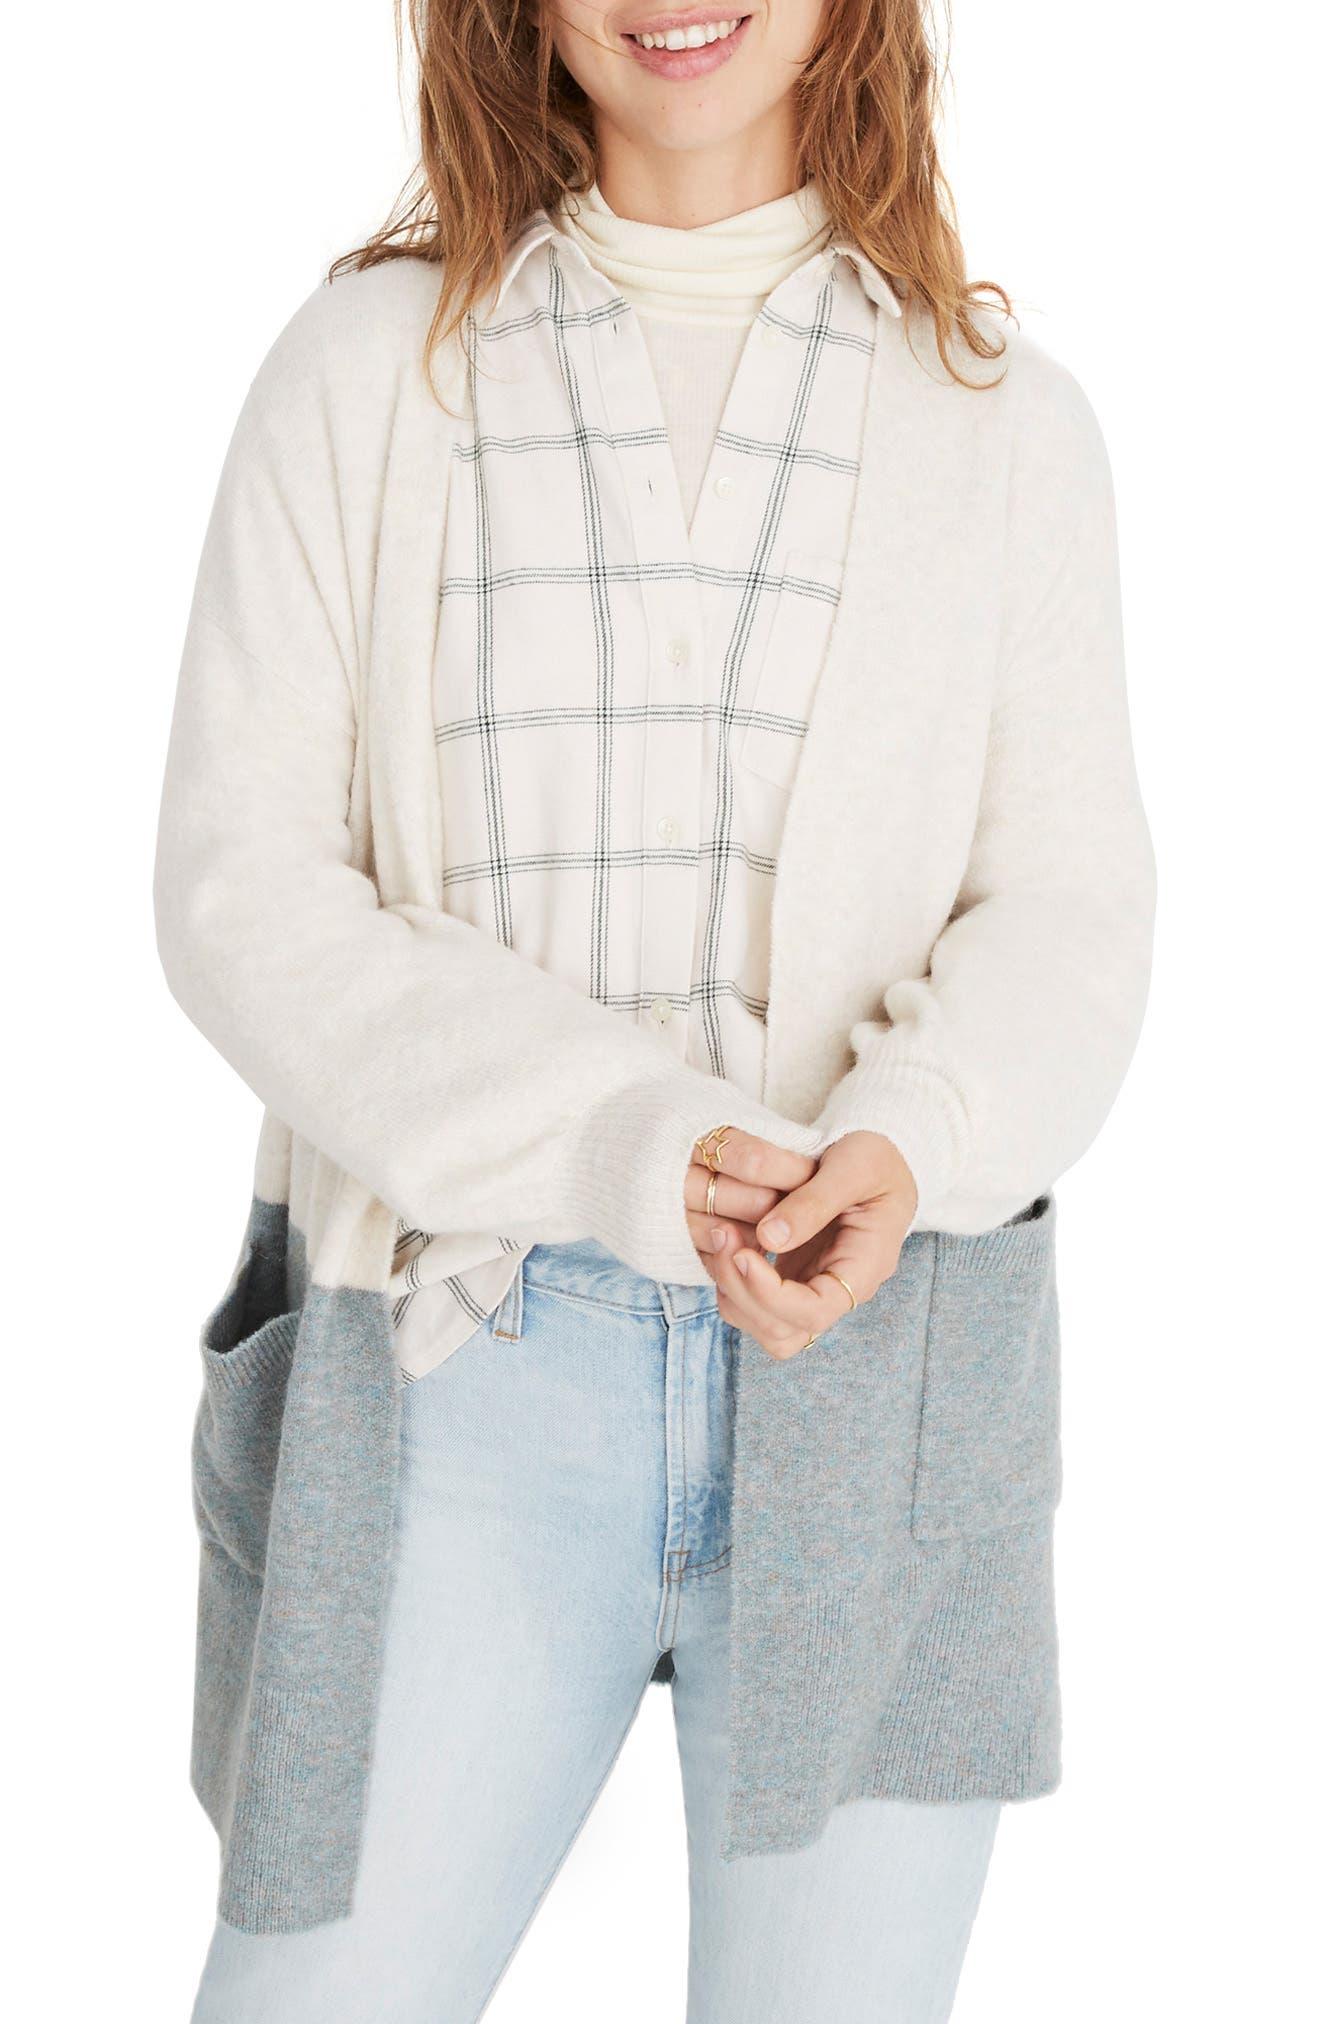 Kent Colorblock Cardigan Sweater,                             Main thumbnail 1, color,                             HEATHER RIVER